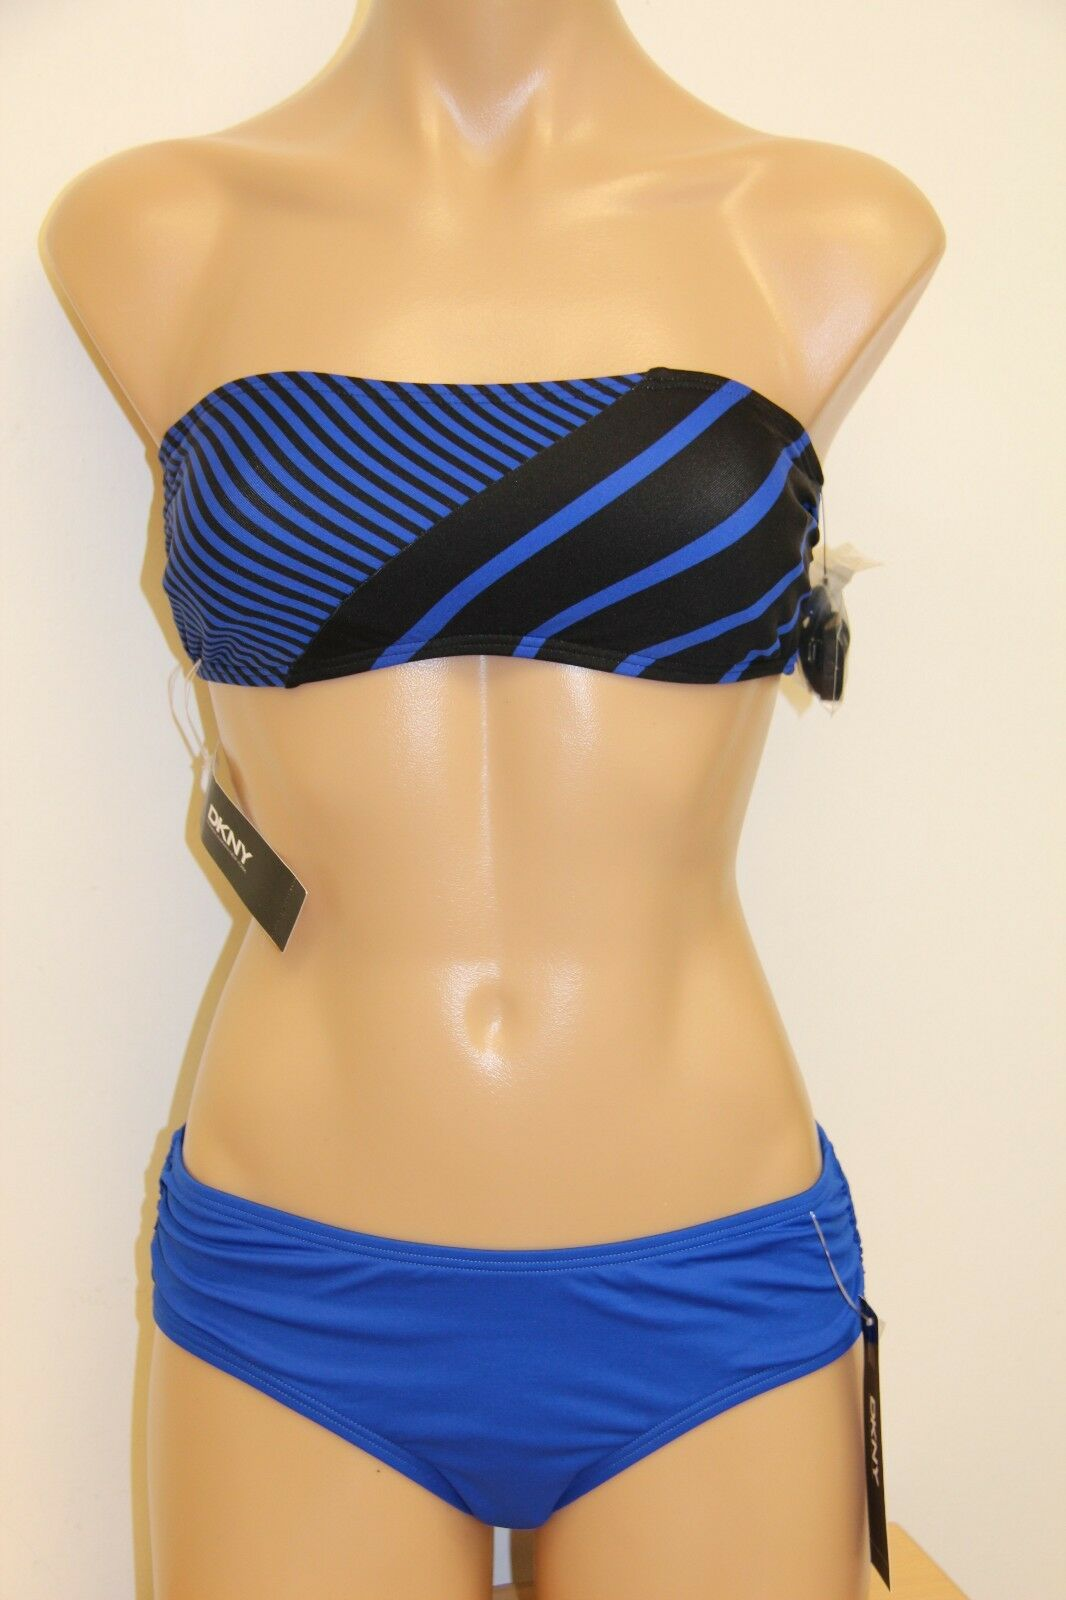 NWT DKNY women Karan Swimsuit Bikini 2pc Set size XS P Classic Electric bluee